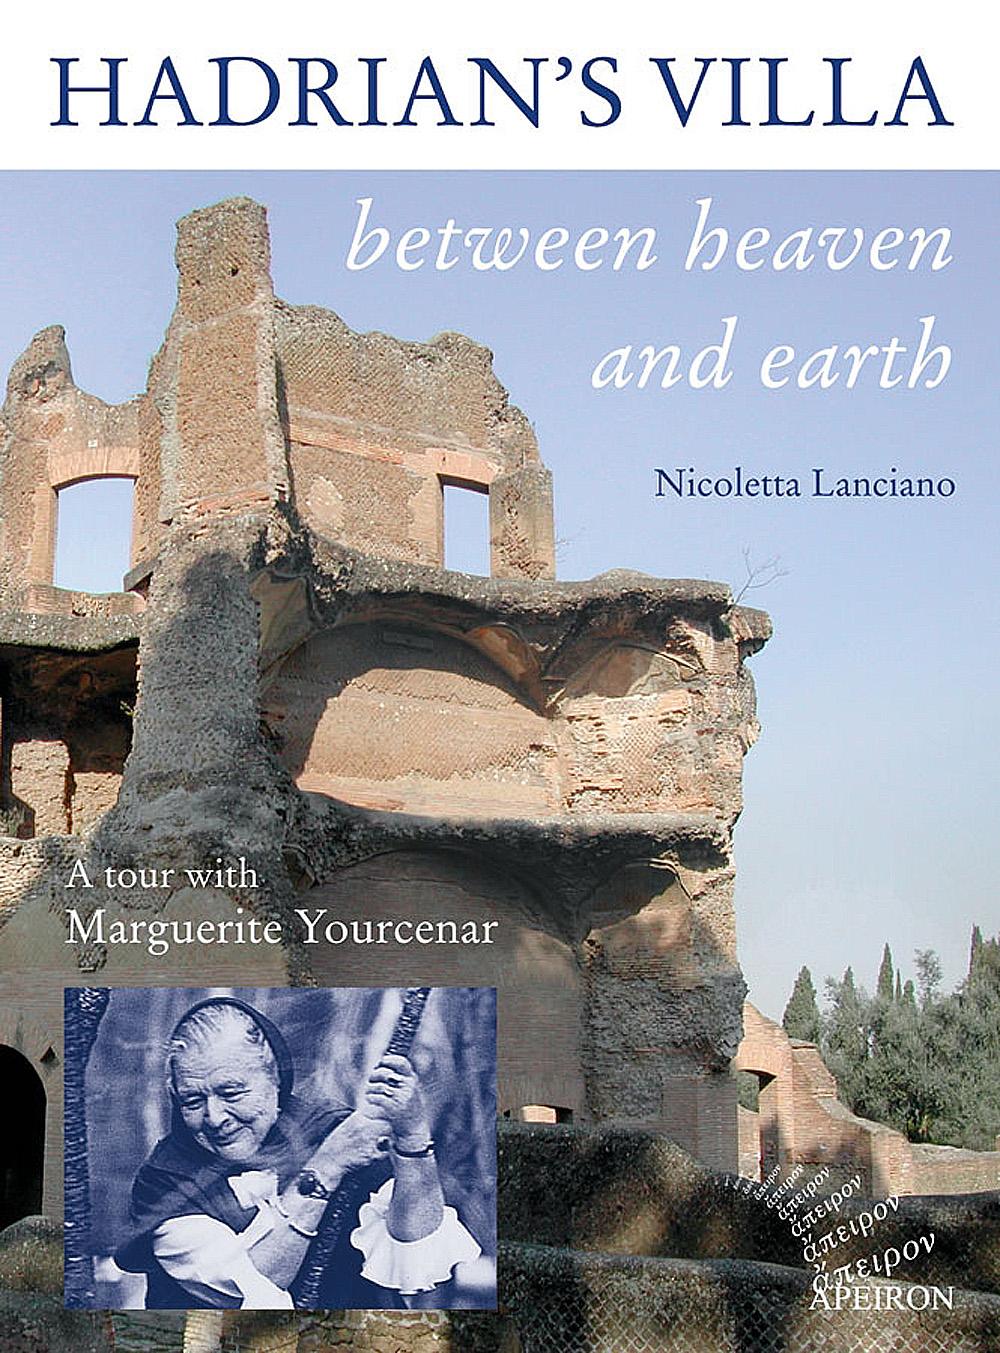 Hadrian's Villa between heaven and earth